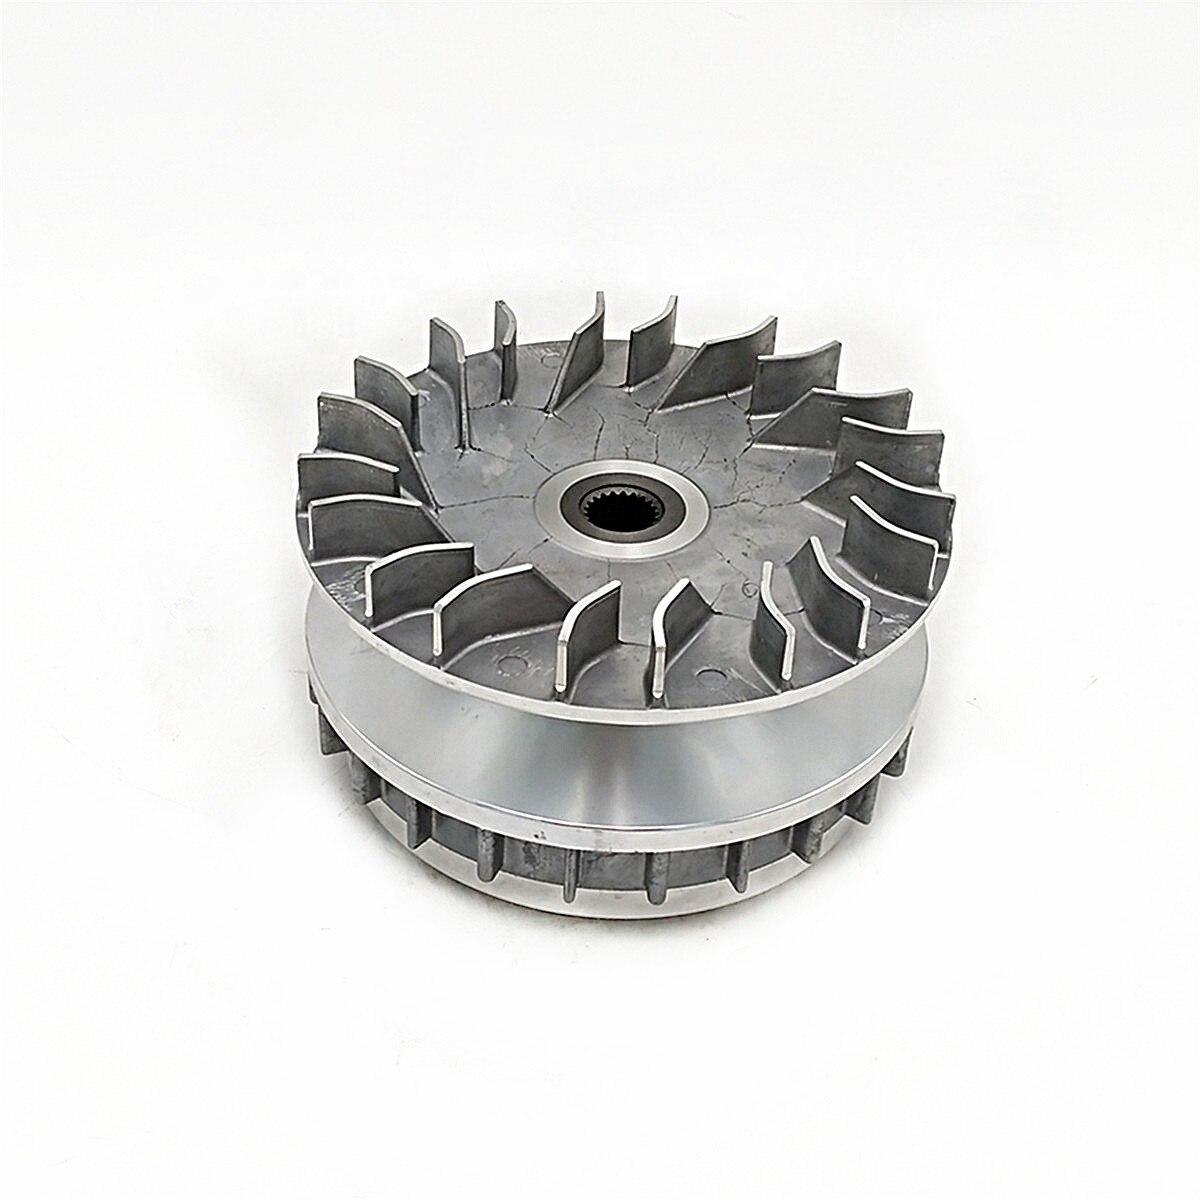 Primary Sheave Disc Assy for HISUN 500cc 700CC ATV UTV QUAD DUNE BUGGY MASSIMO MENARDS MSU YS BENNCHE ENGINE PARTS enlarge